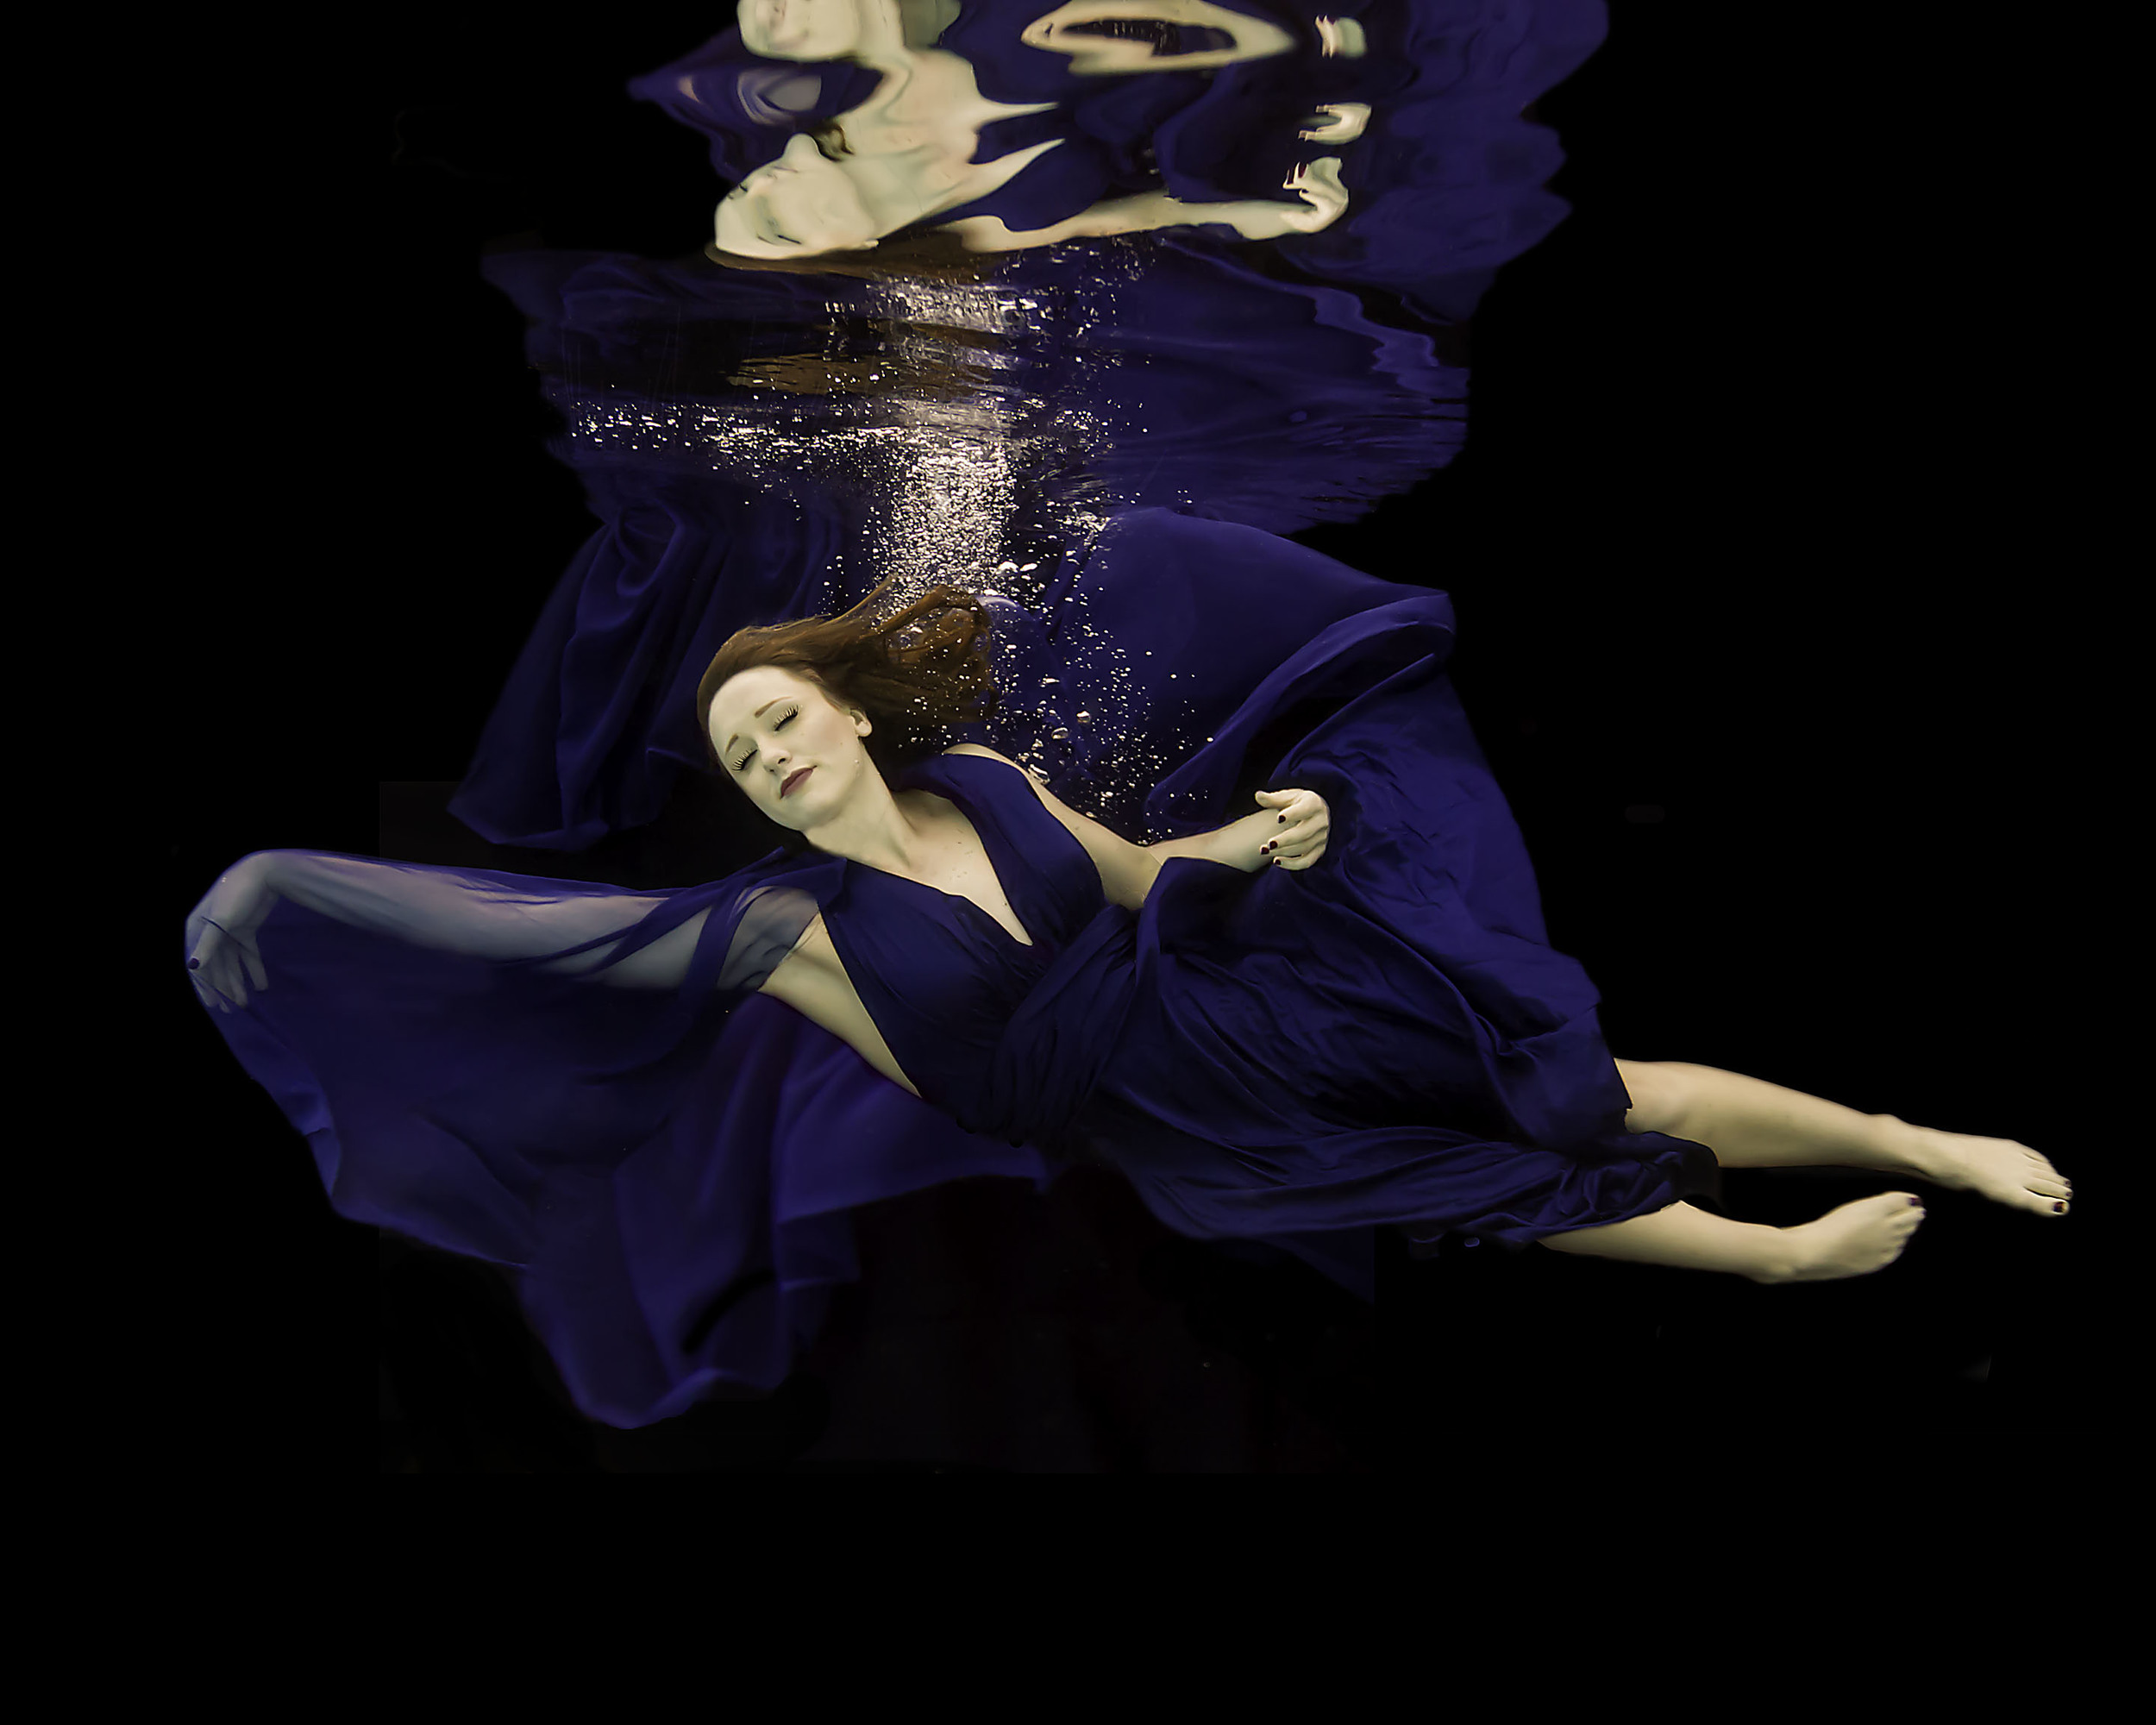 Underwater Black _Sharpened.jpg